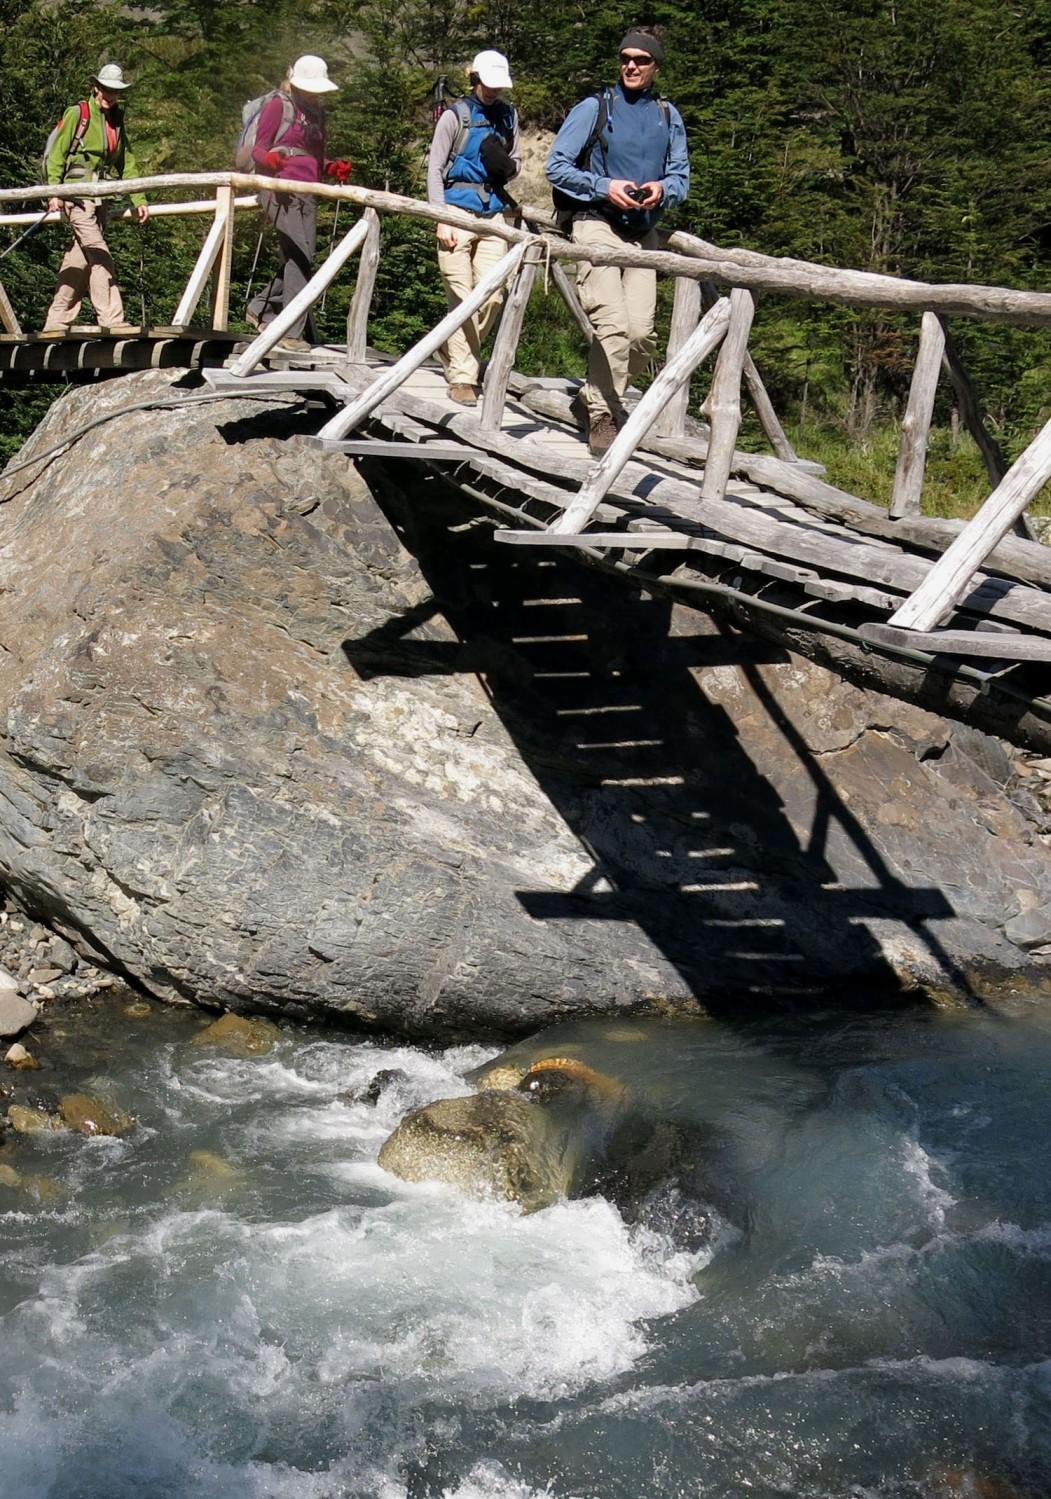 Patagonia-Paine-W-Trek-Day1-Torres-Del-Paine-Hike-Bridge